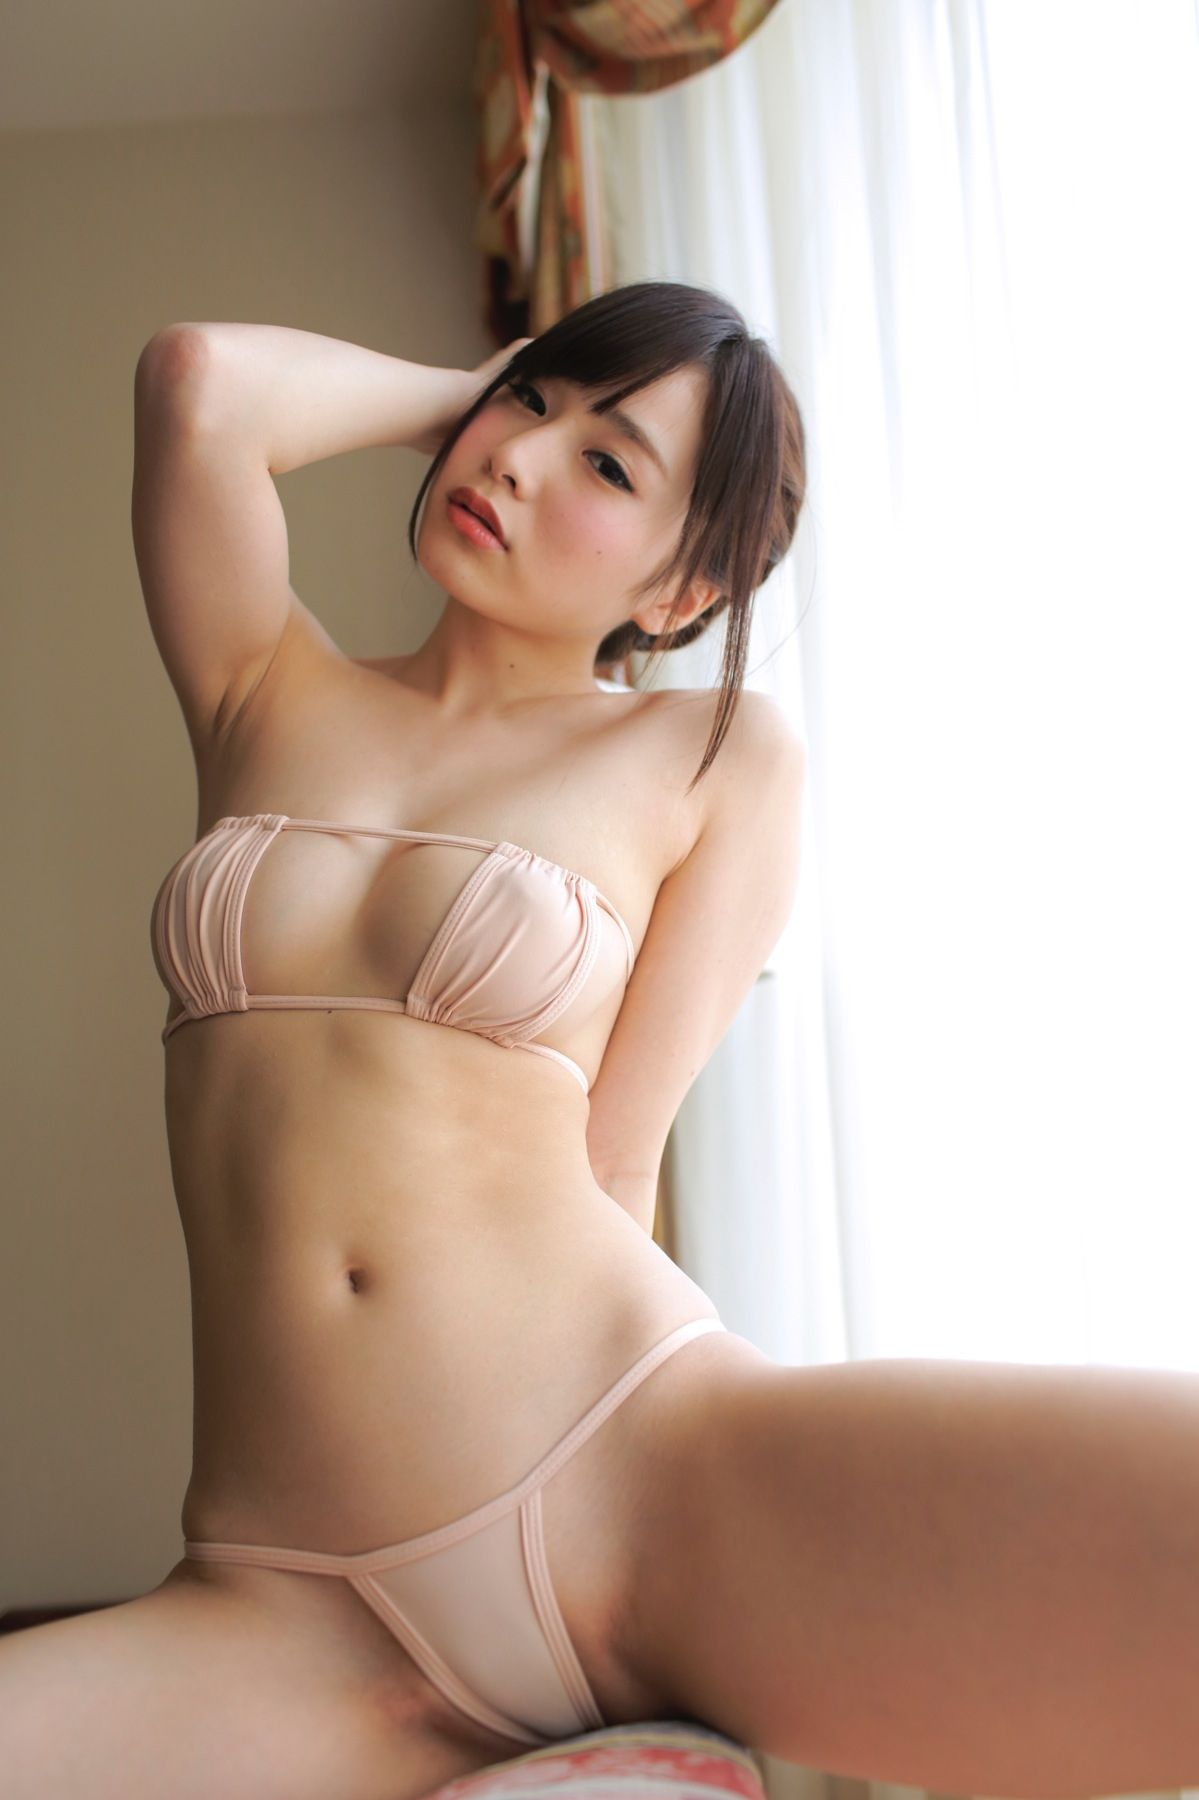 Sexy Lady Japan Megumi Aisaka Nov 02, 2016 8